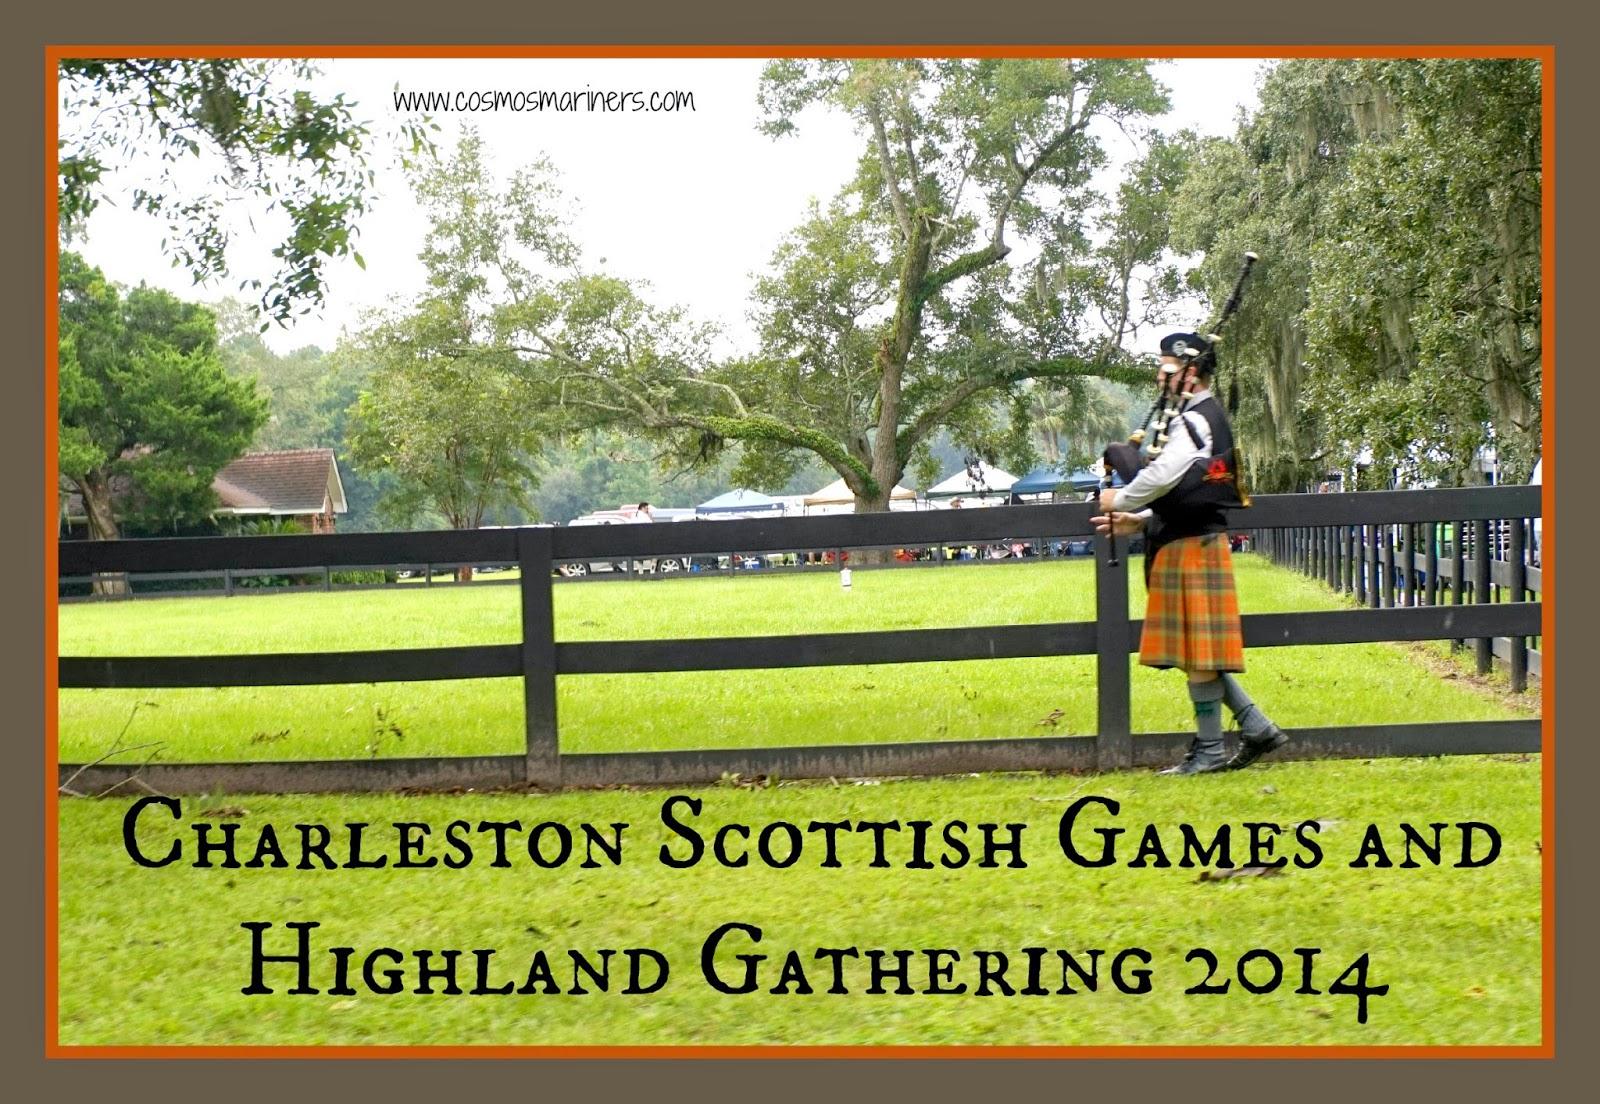 Charleston Scottish Games and Highland Gathering at Boone Hall